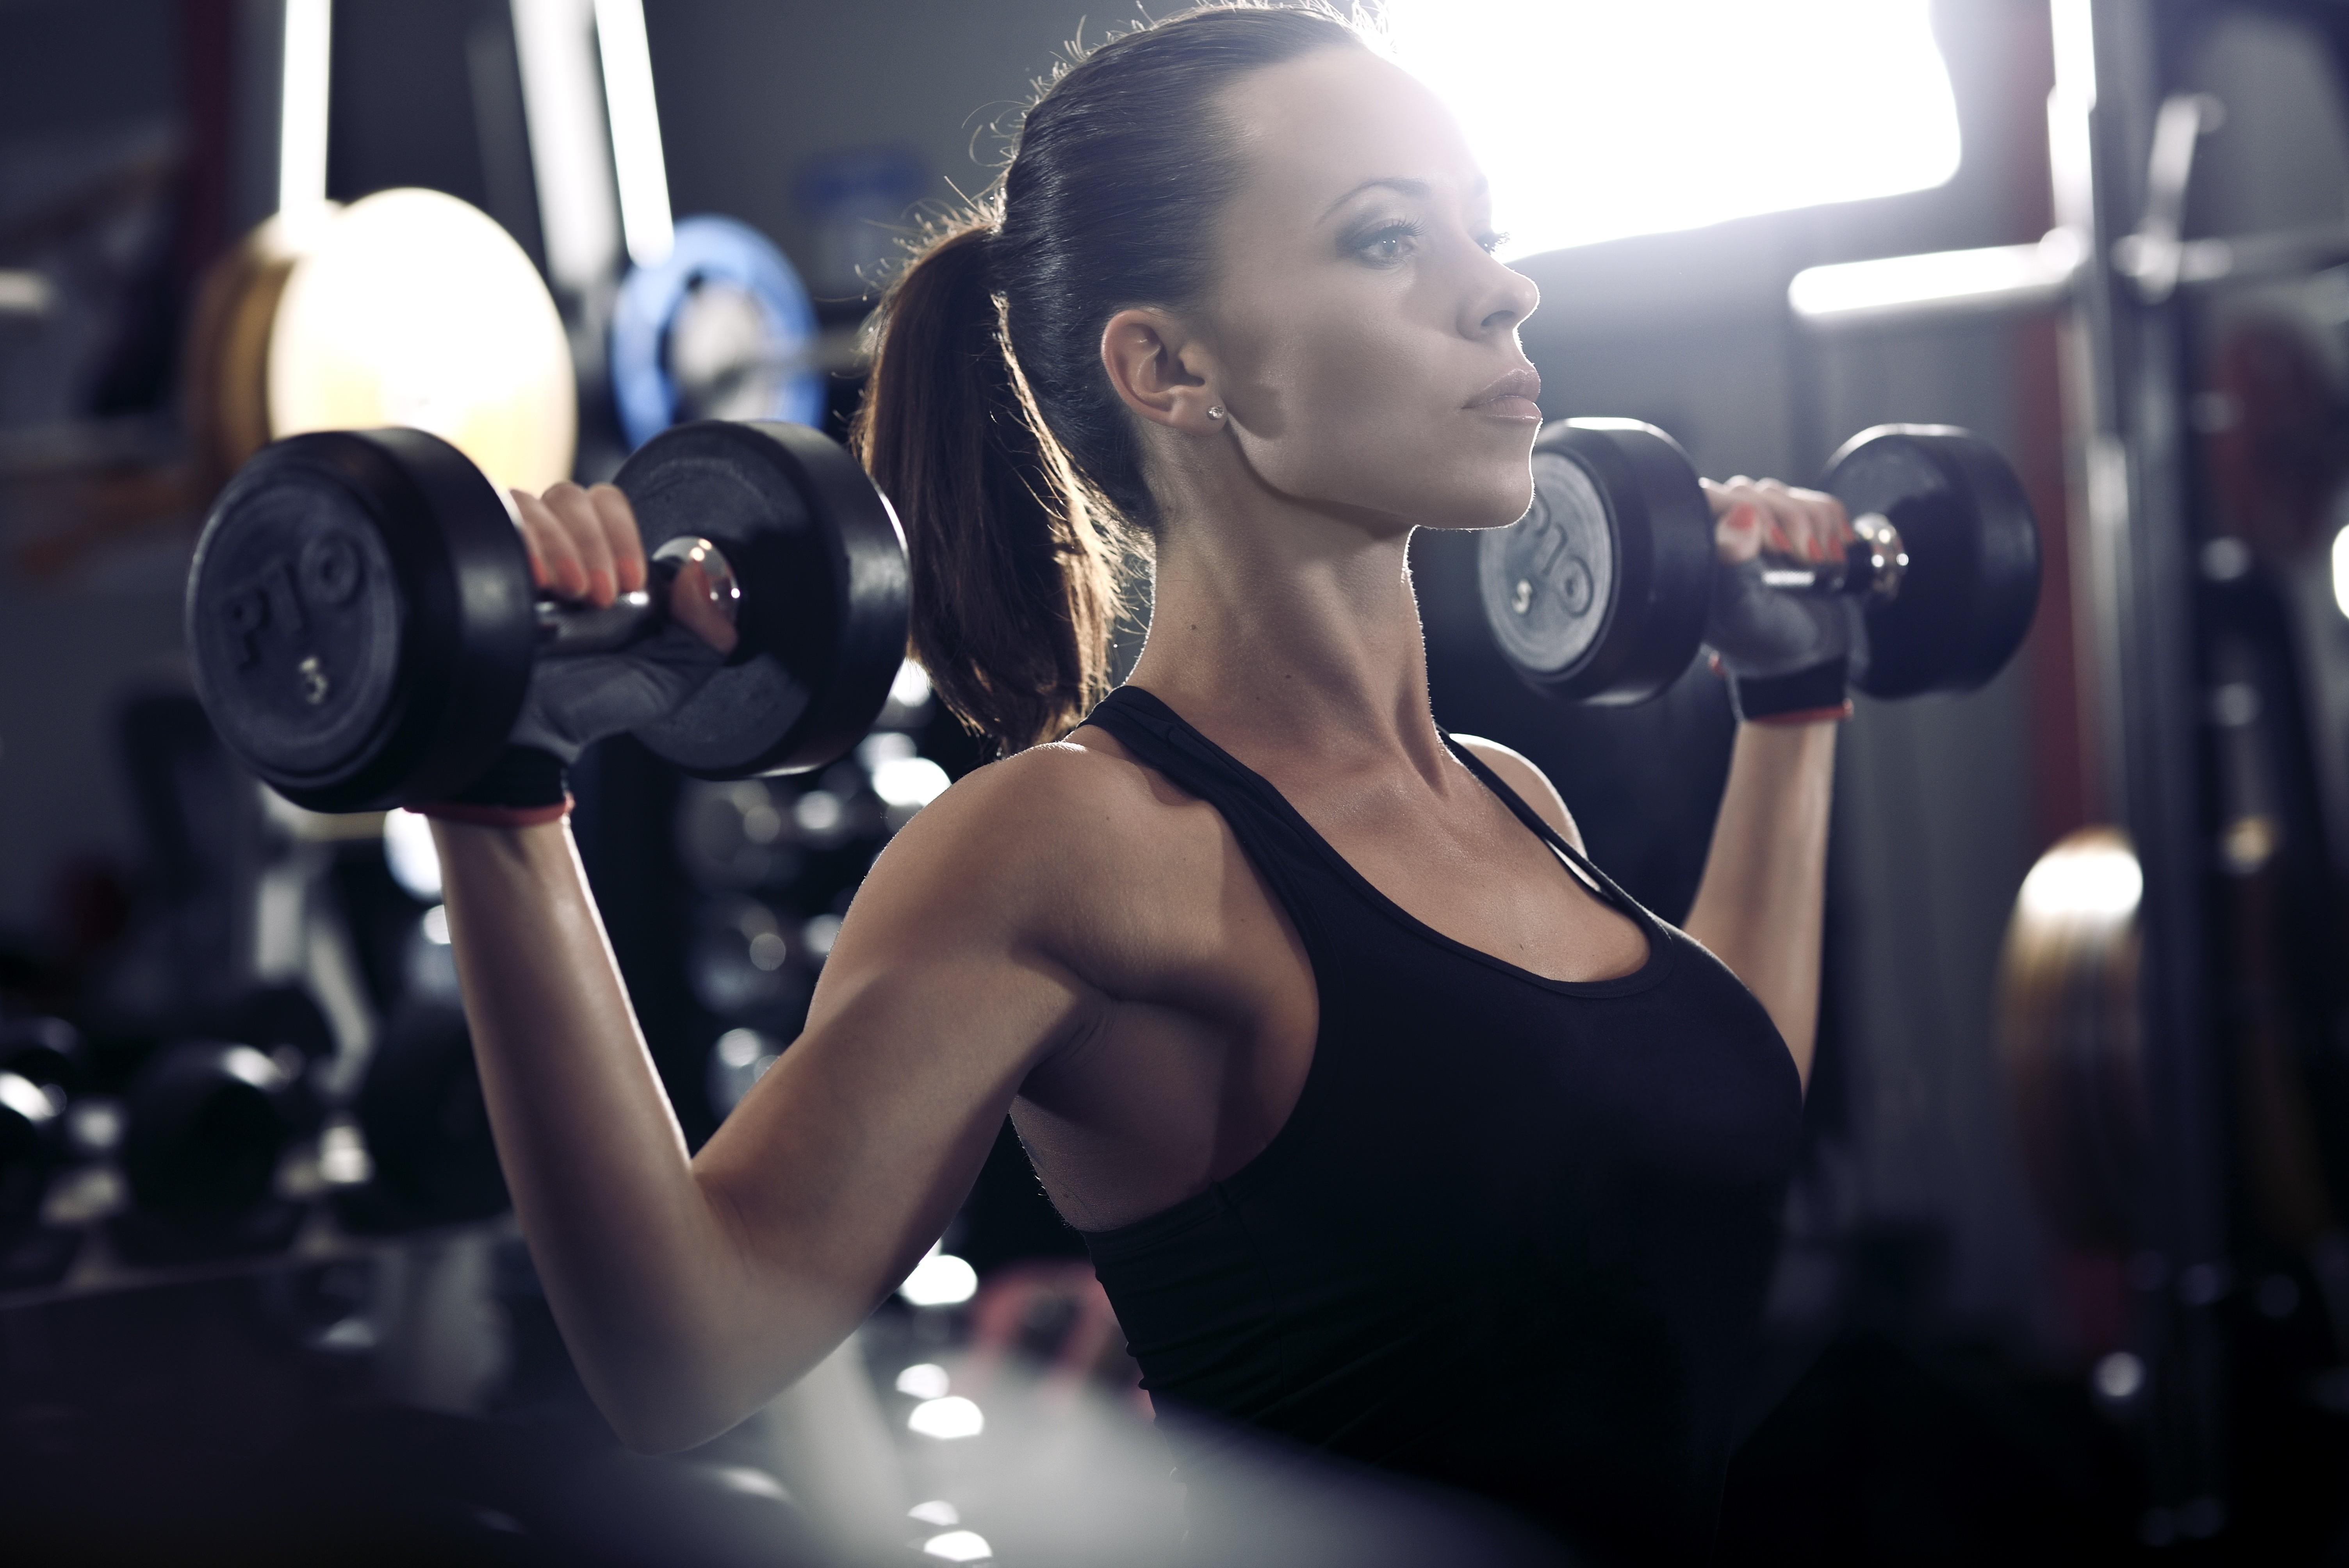 Wallpaper sports women room fitness model ponytail - Wallpaper fitness women ...